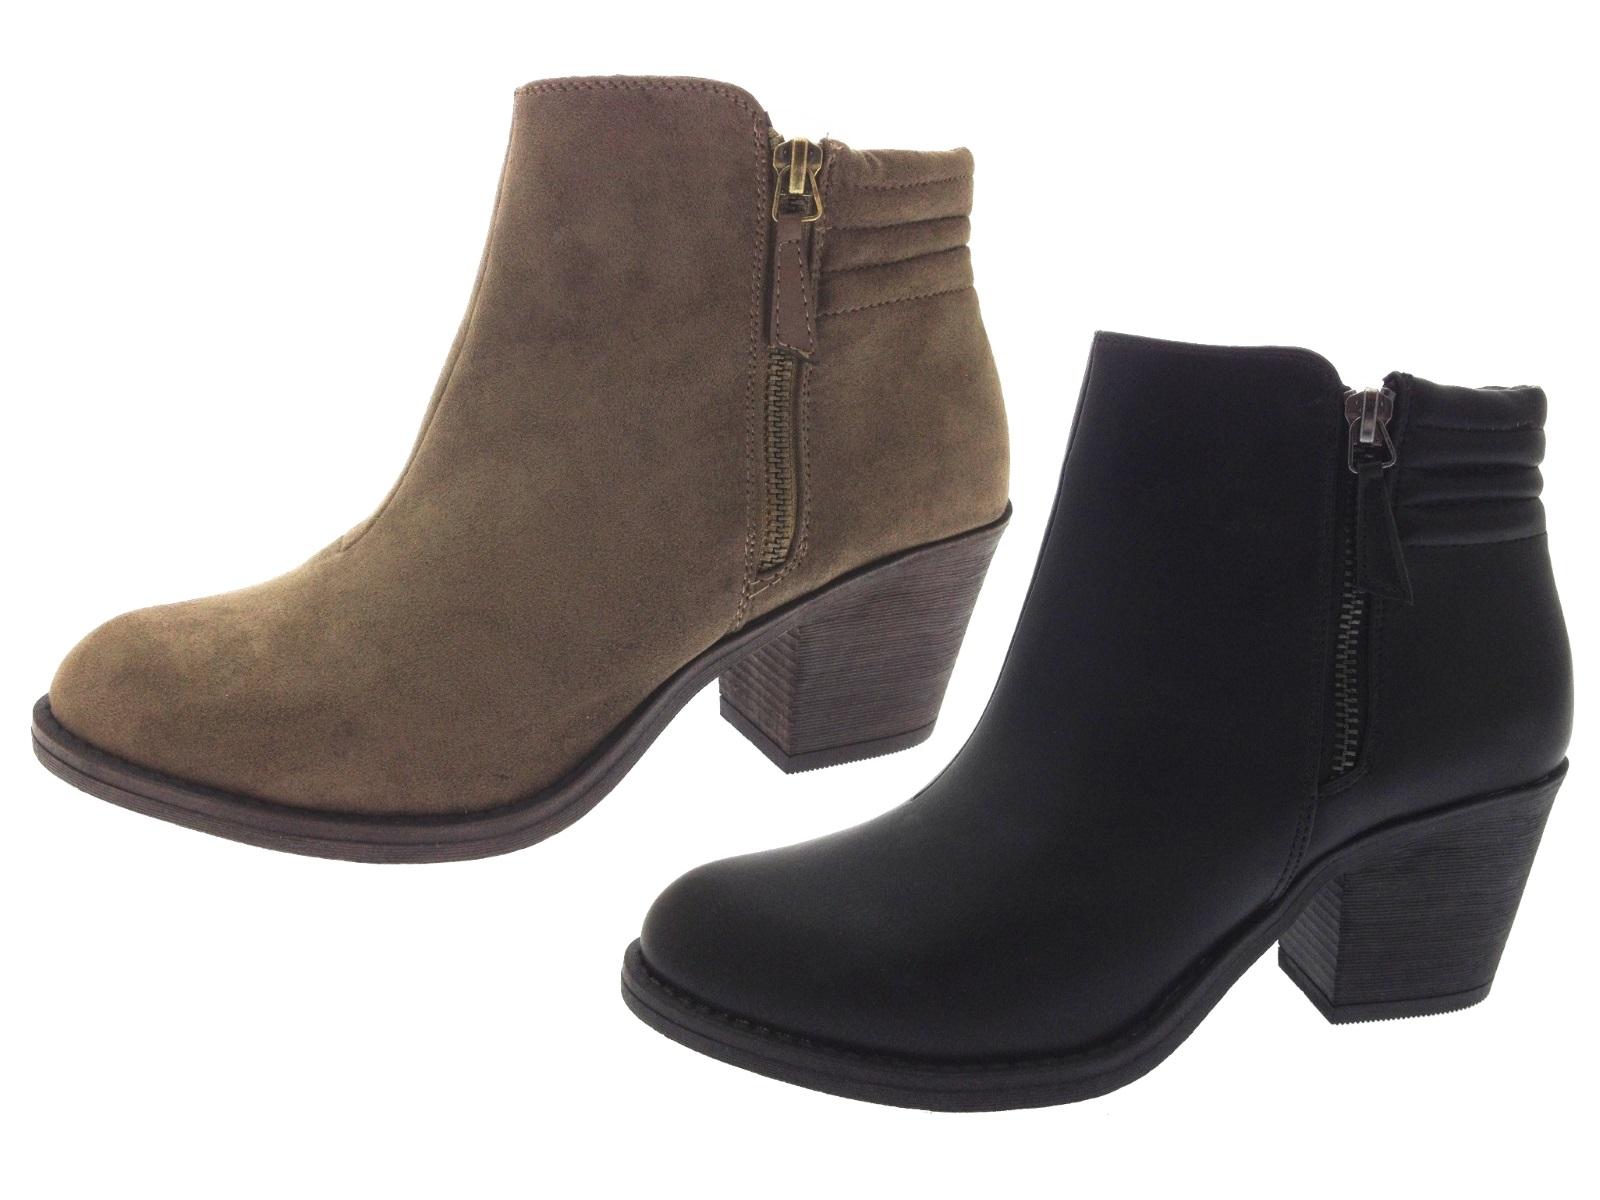 Womens Chelsea Biker Ankle Boots Block Heels Faux Leather Shoes Girls Size 3-8 | EBay